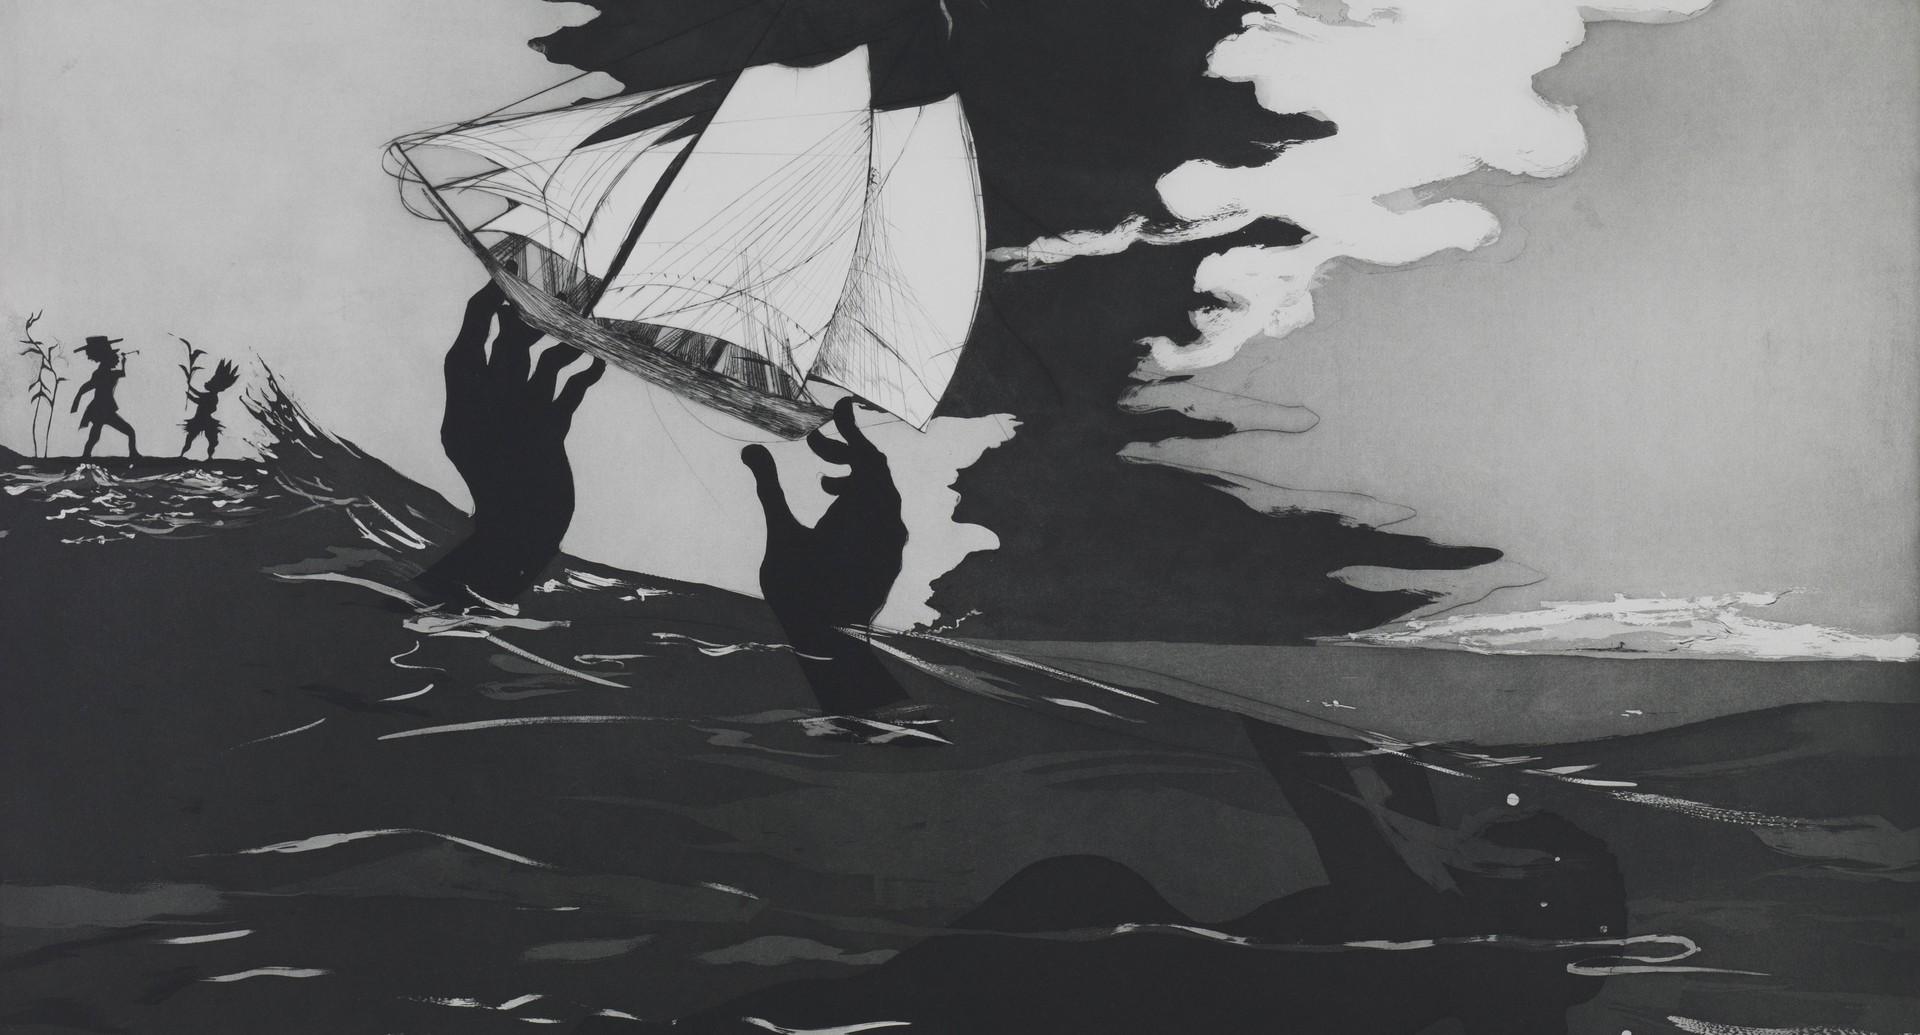 Kara Walker painting An Unpeopled Land in Uncharted Waters